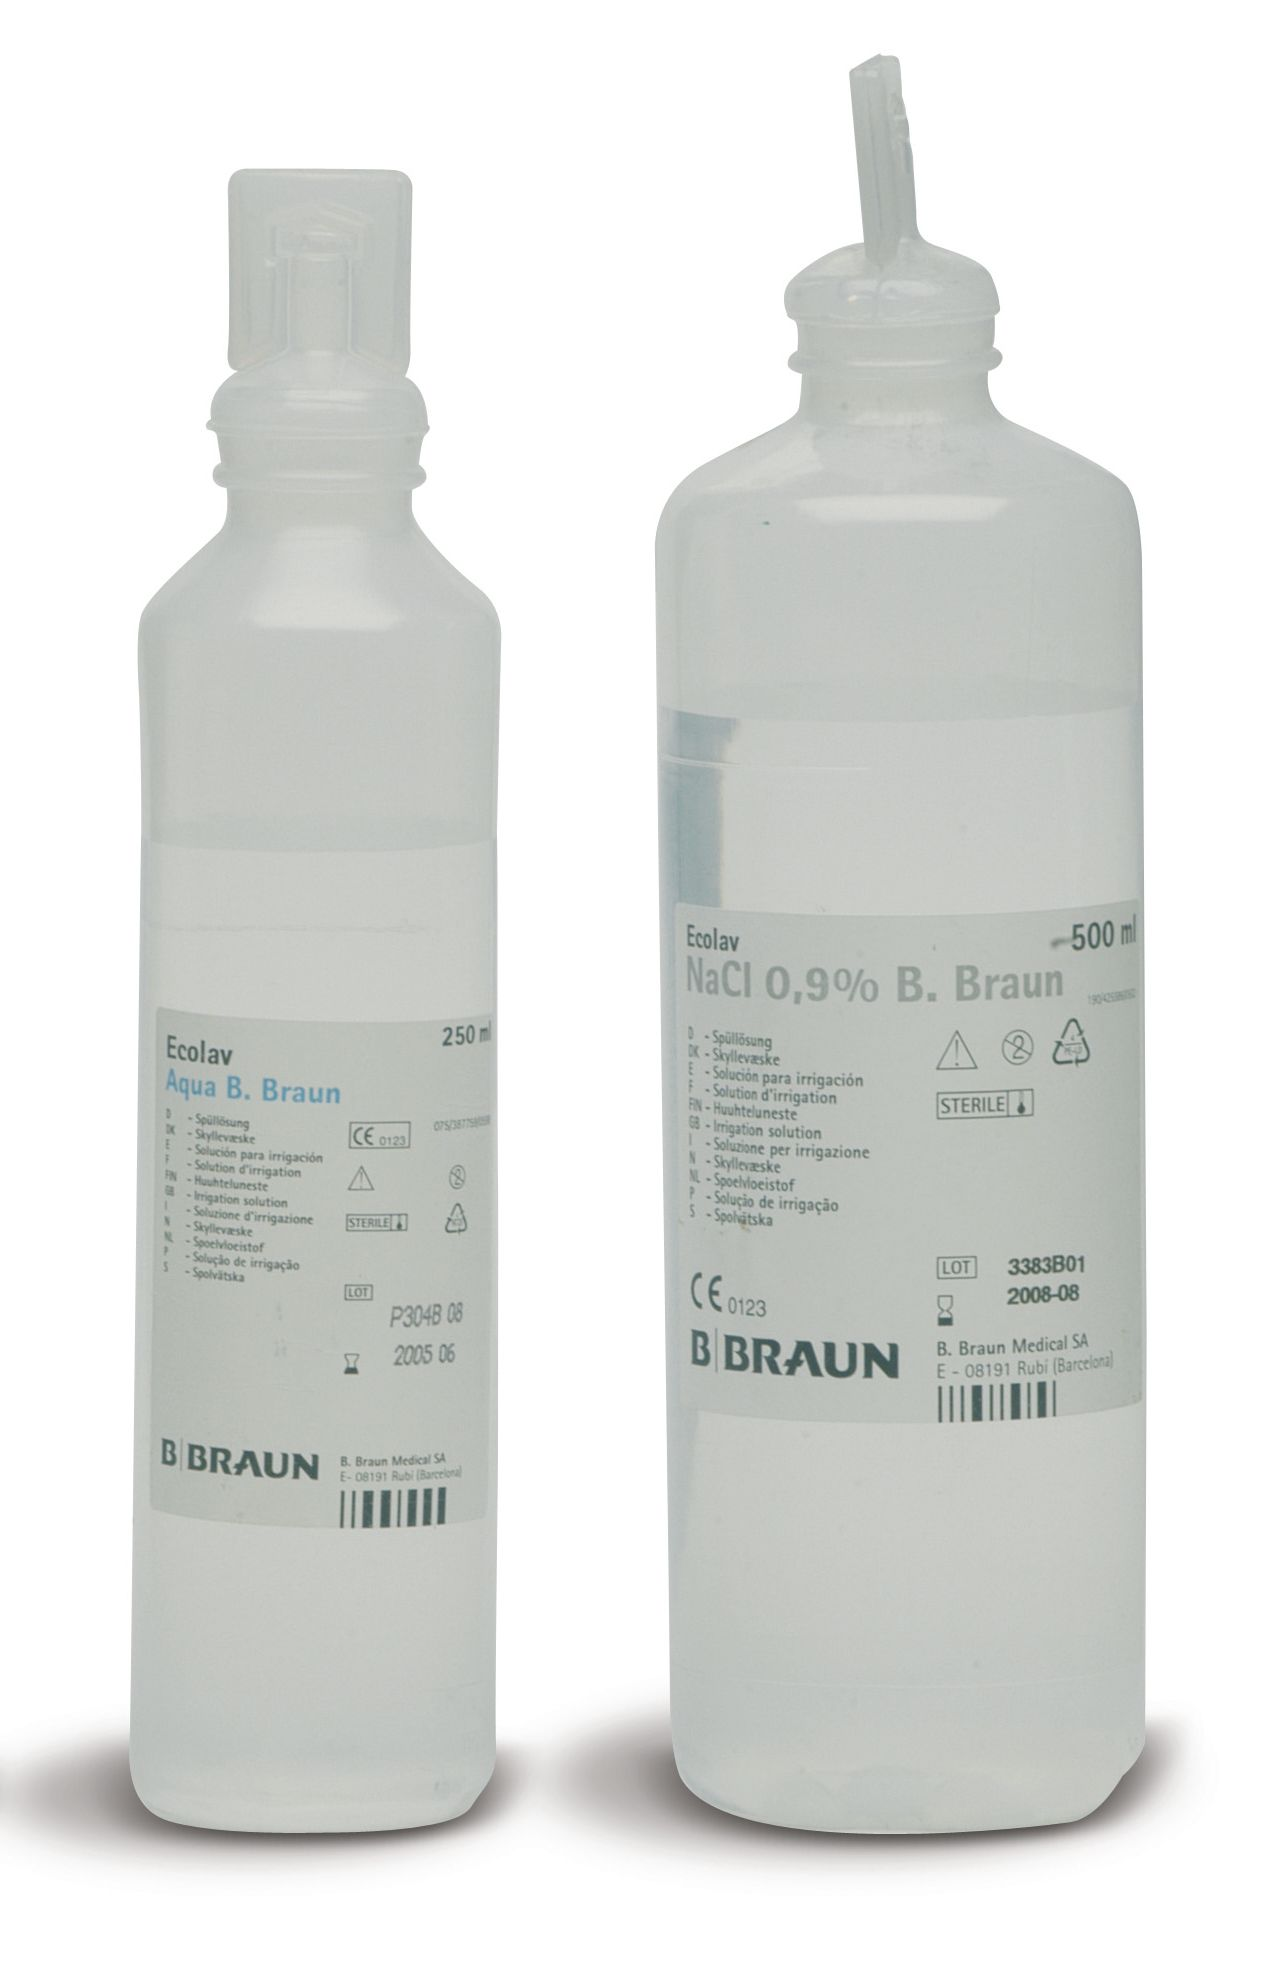 Soluzione fisiologica sodio di cloruro 500ml SOL004 3700443100011